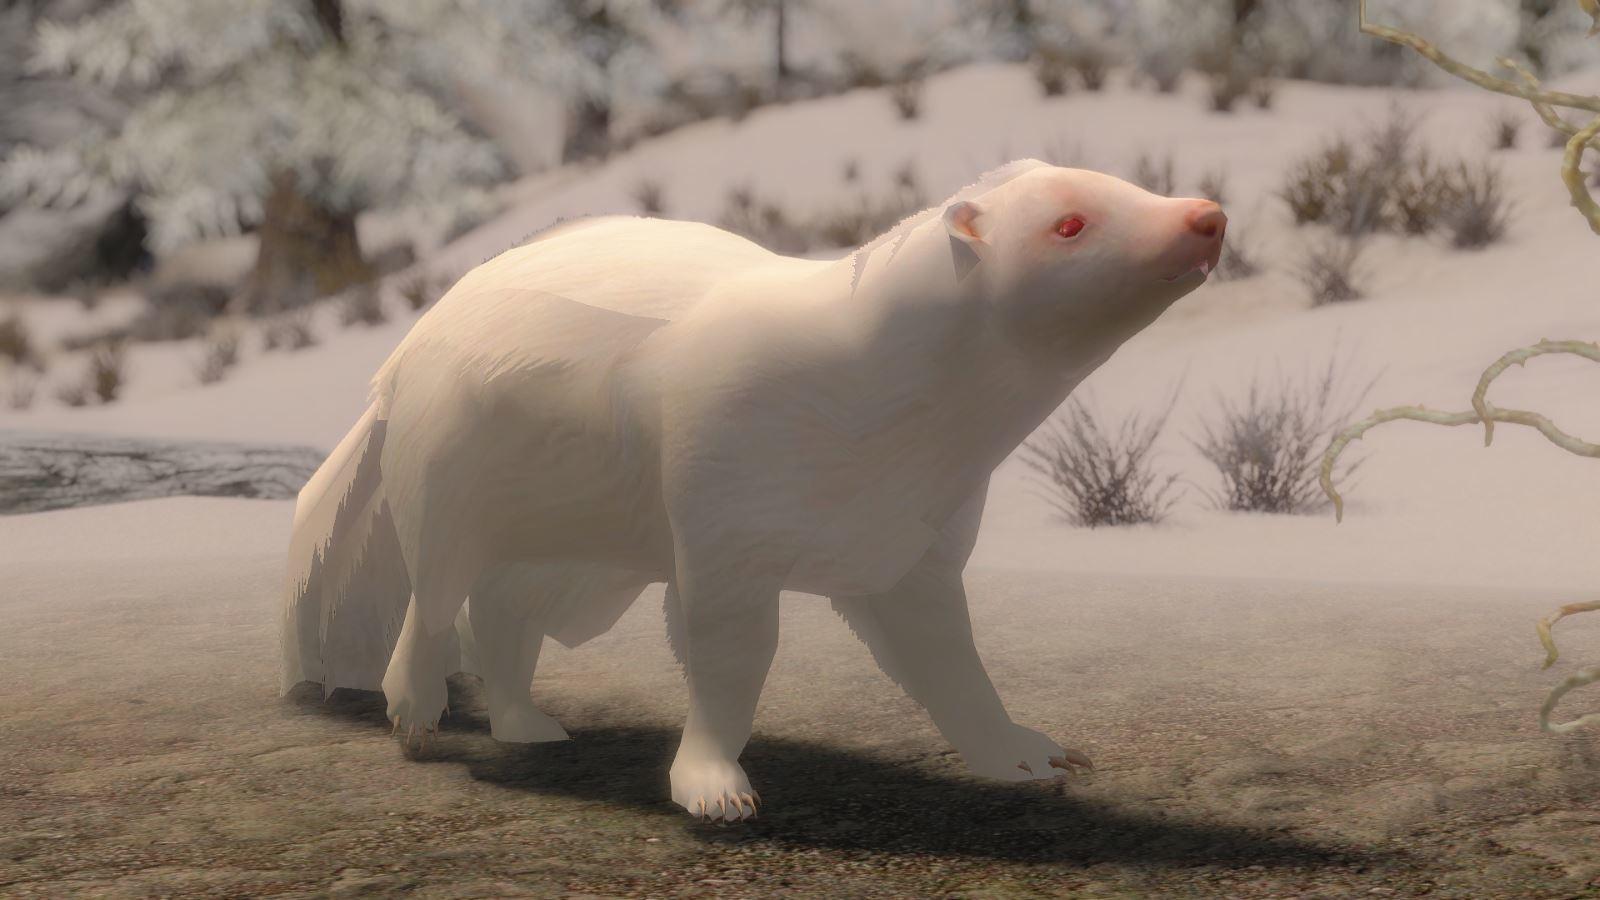 RacoonSkunkMihailSK 121-1 Pose SnowSkunk 1